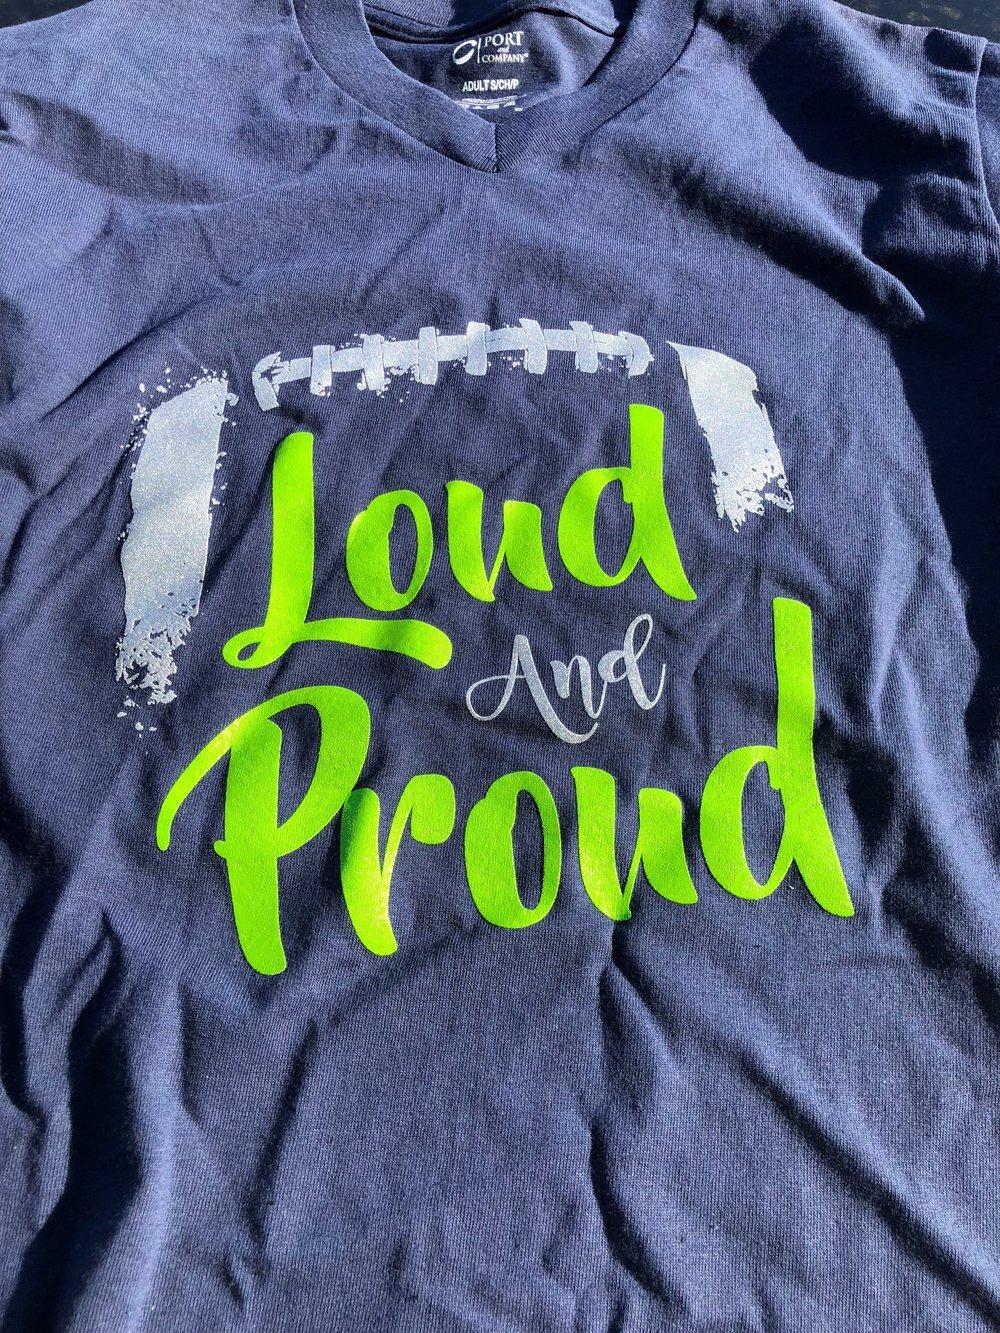 logounltd_laser_etching_embroidery_screen_printing_apparel_uniform_custom_tshirts_dye_sublimation_kirkland_bellevue_seattle_redmond_branded_merchandise_promotional_products_logo_unltd_seahawks (1).jpg